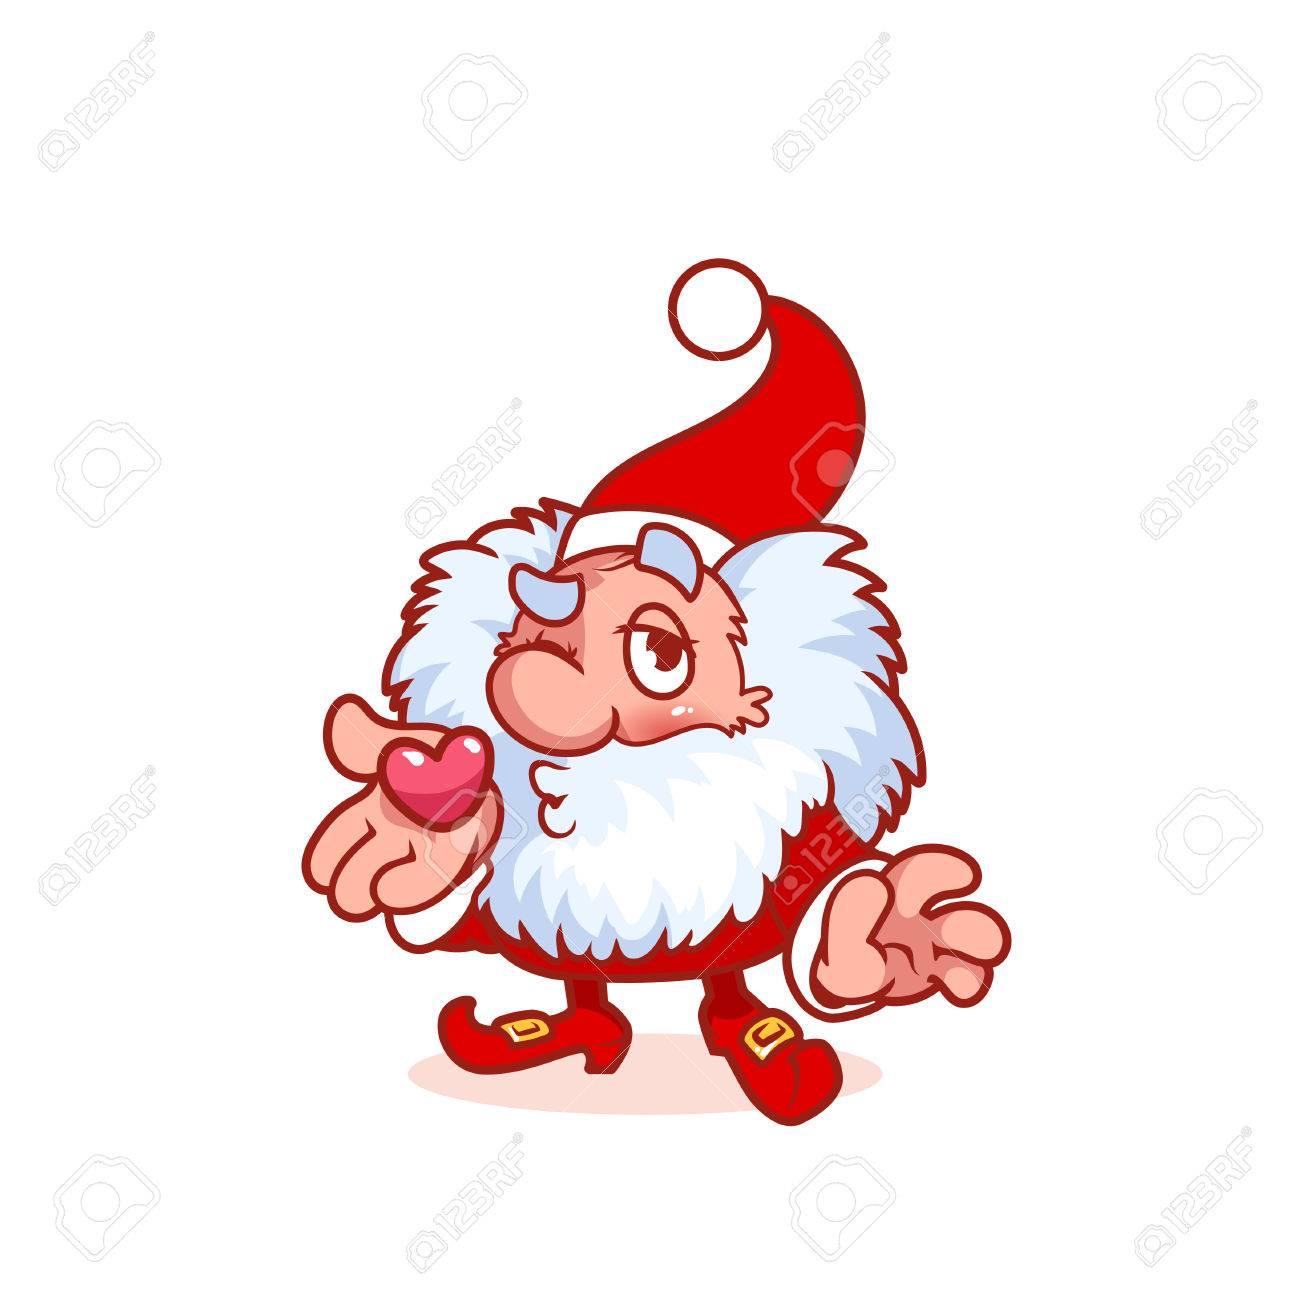 Christmas Gnomes Clipart.Christmas Gnome Funny Cartoon Character Clip Art Illustration